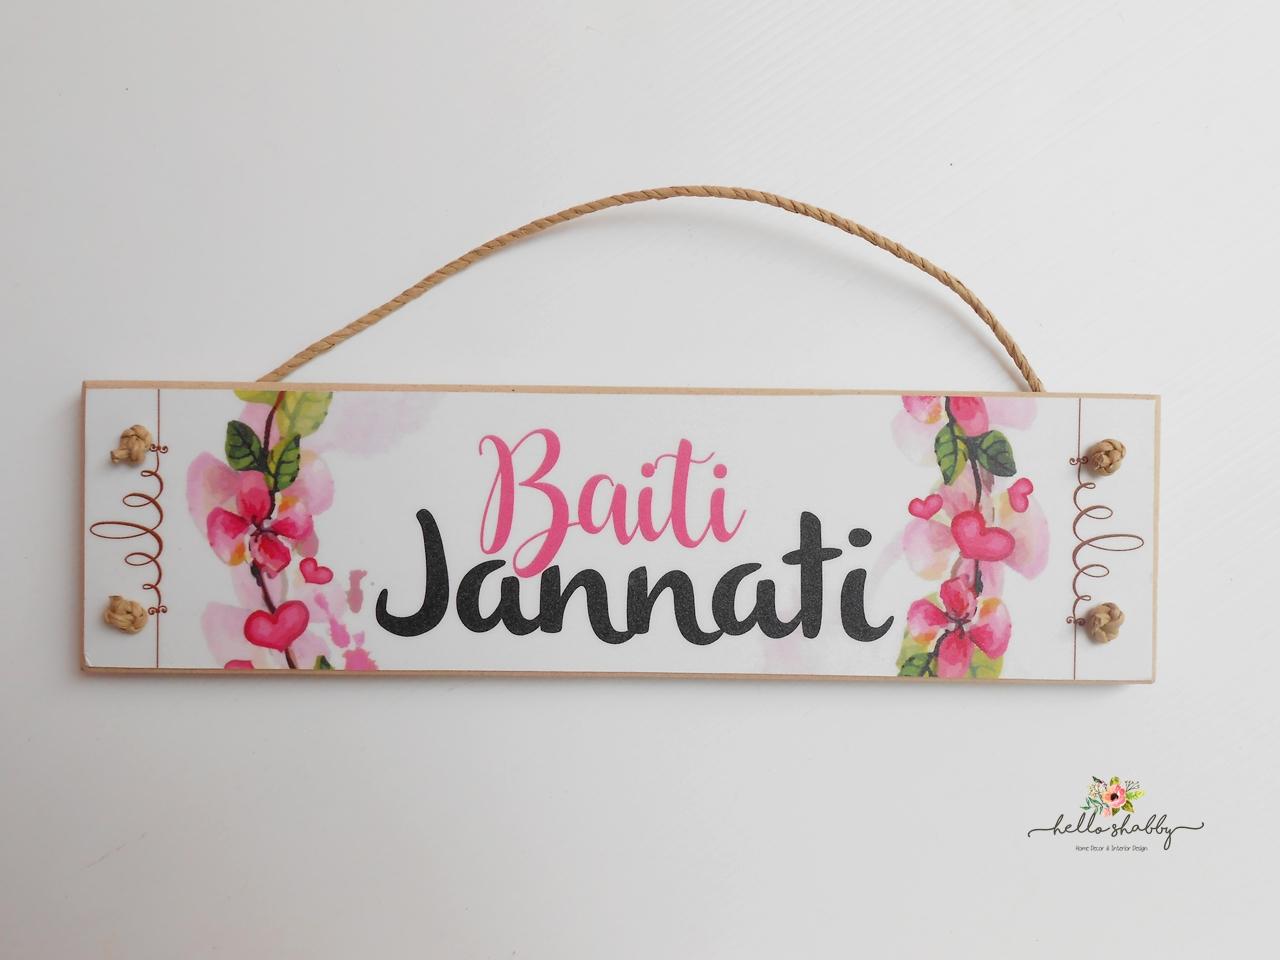 Pusat Wall Decor Unik (Hiasan Dinding) Cantik dan Shabby Chic di Jakarta ~ Homeshabby.com : The Best Ideas and Good Information